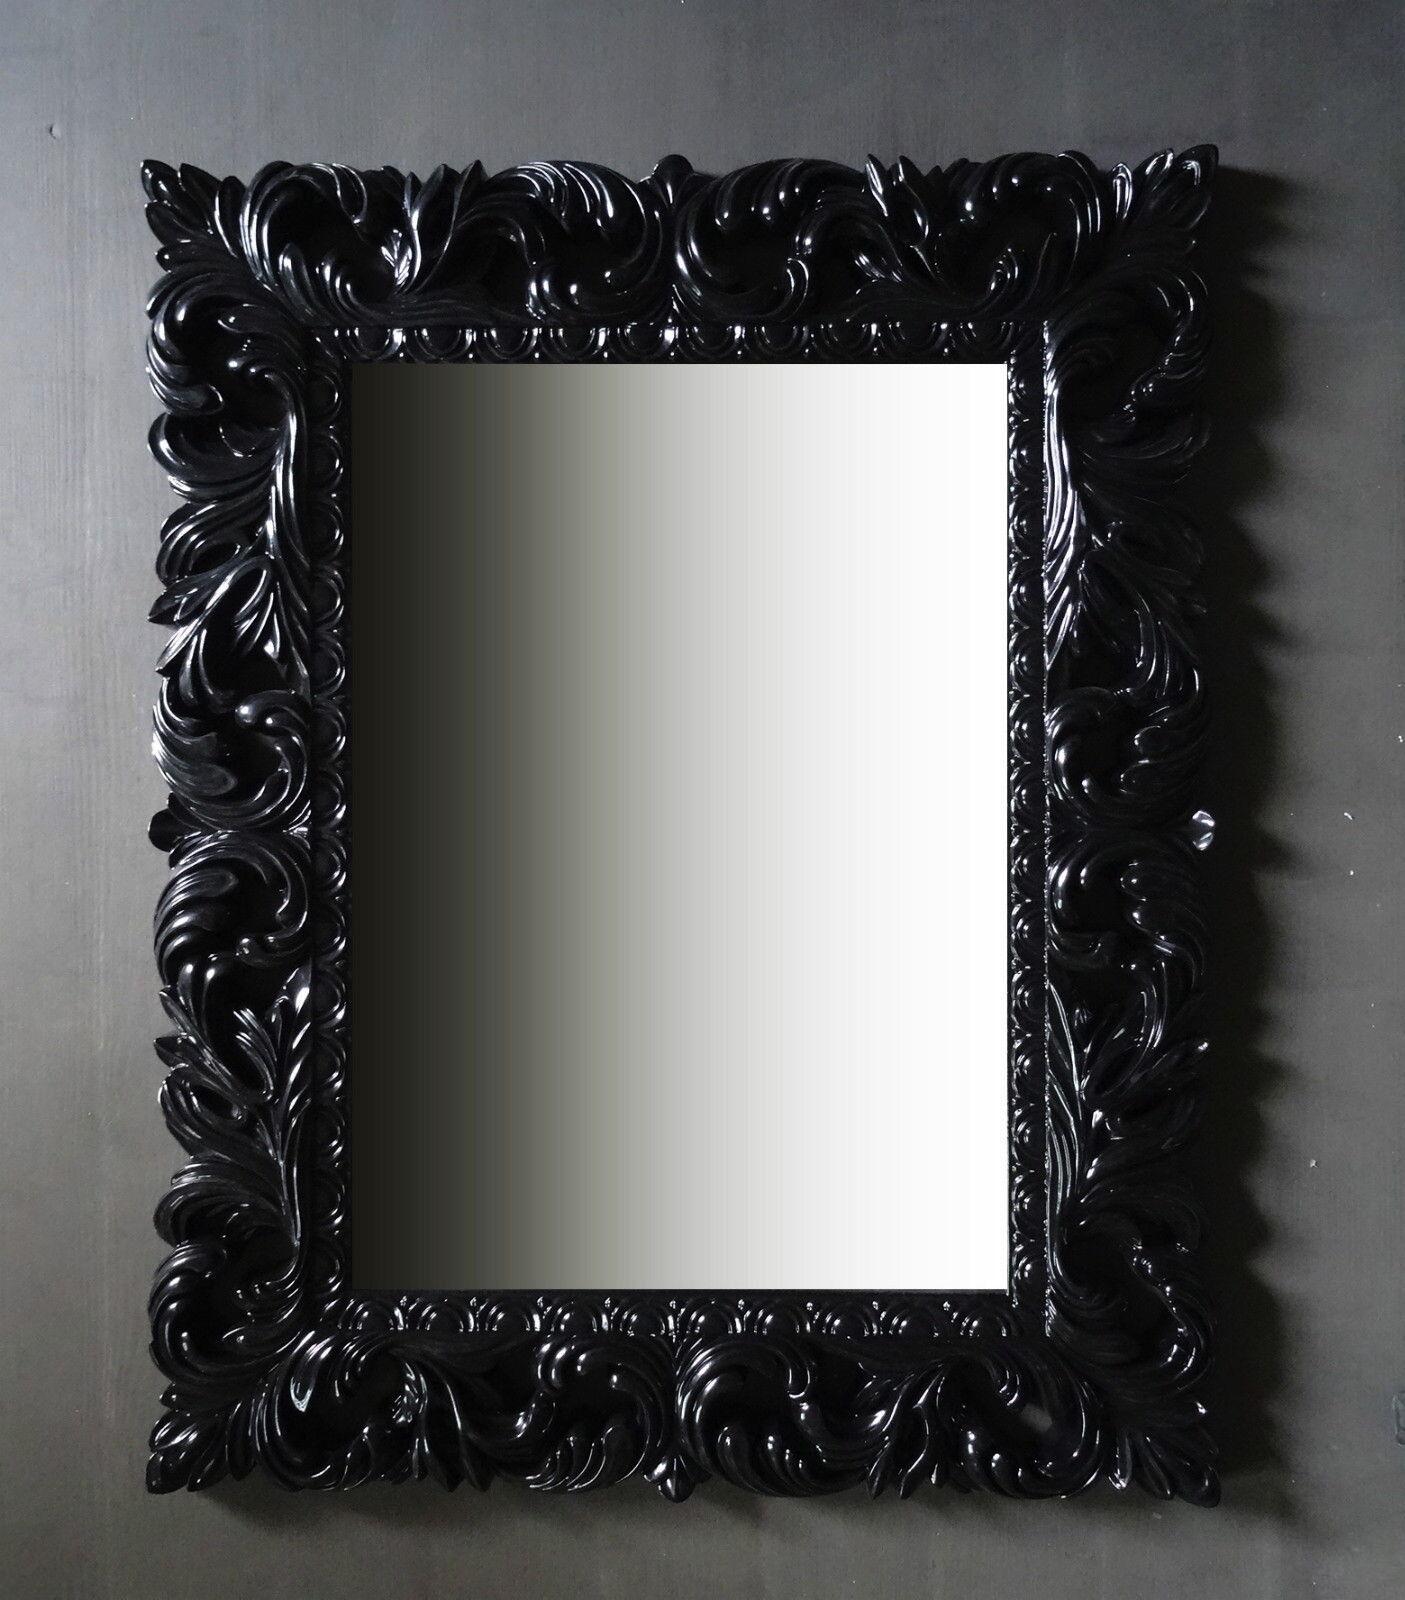 wandspiegel schwarz ornament 100x80 standspiegel spiegel. Black Bedroom Furniture Sets. Home Design Ideas